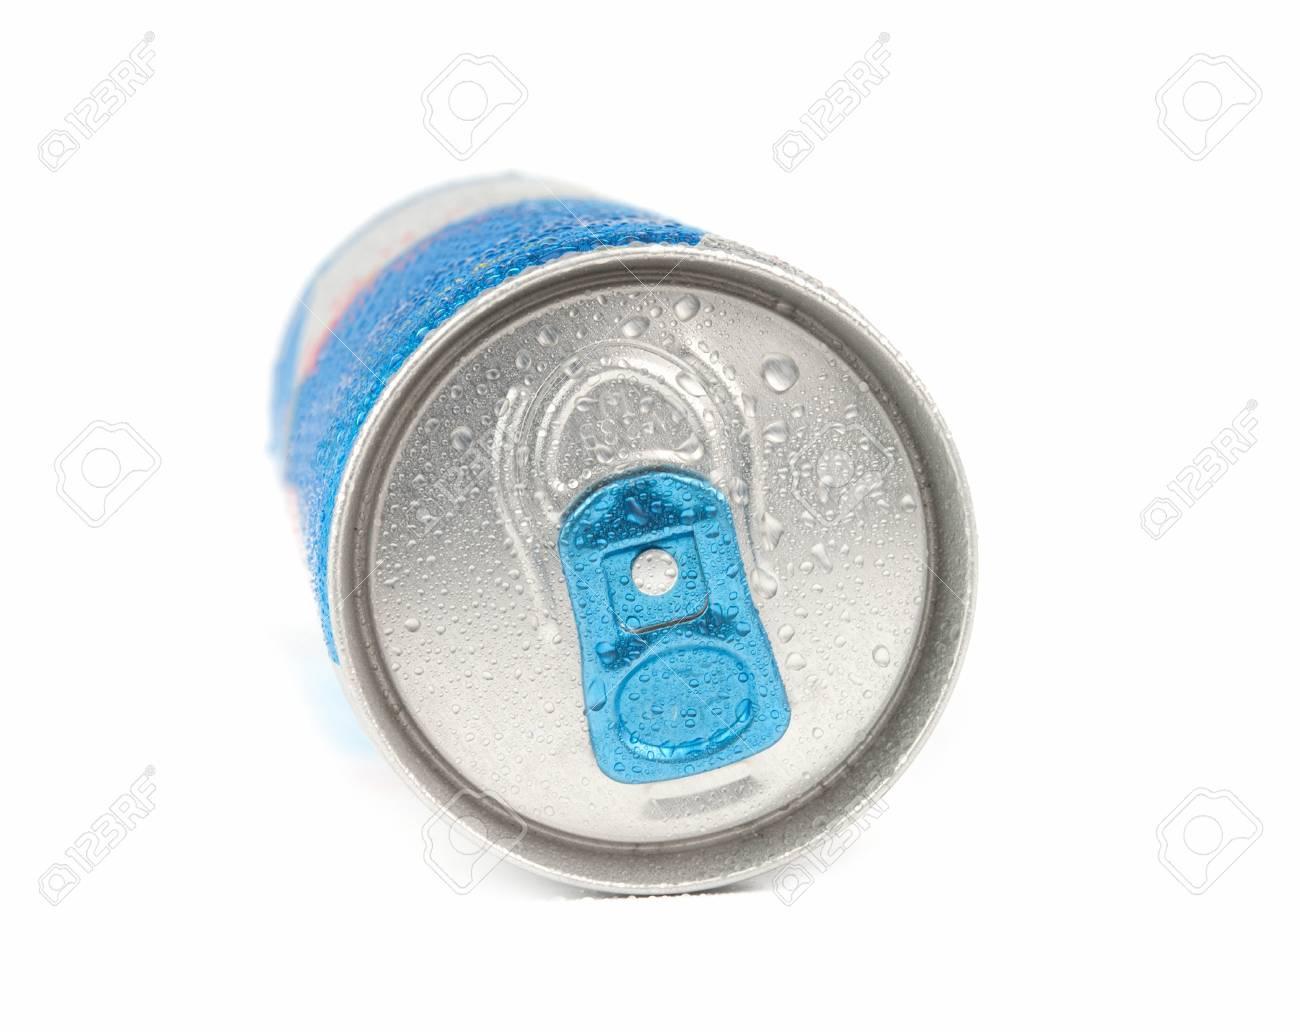 energy drink in blue metal can - 17093726